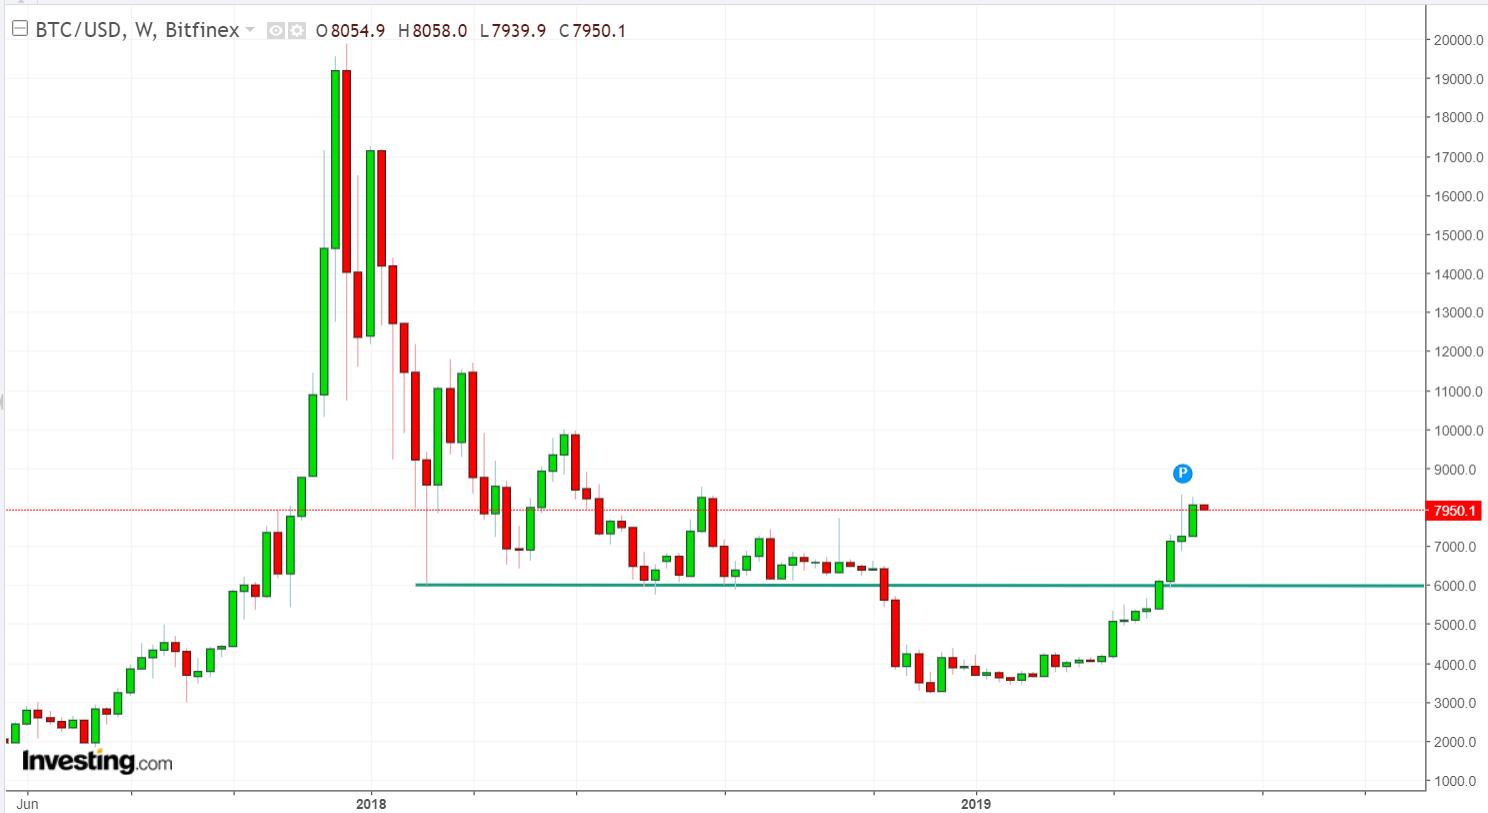 Analýza Bitcoin na Investing.com